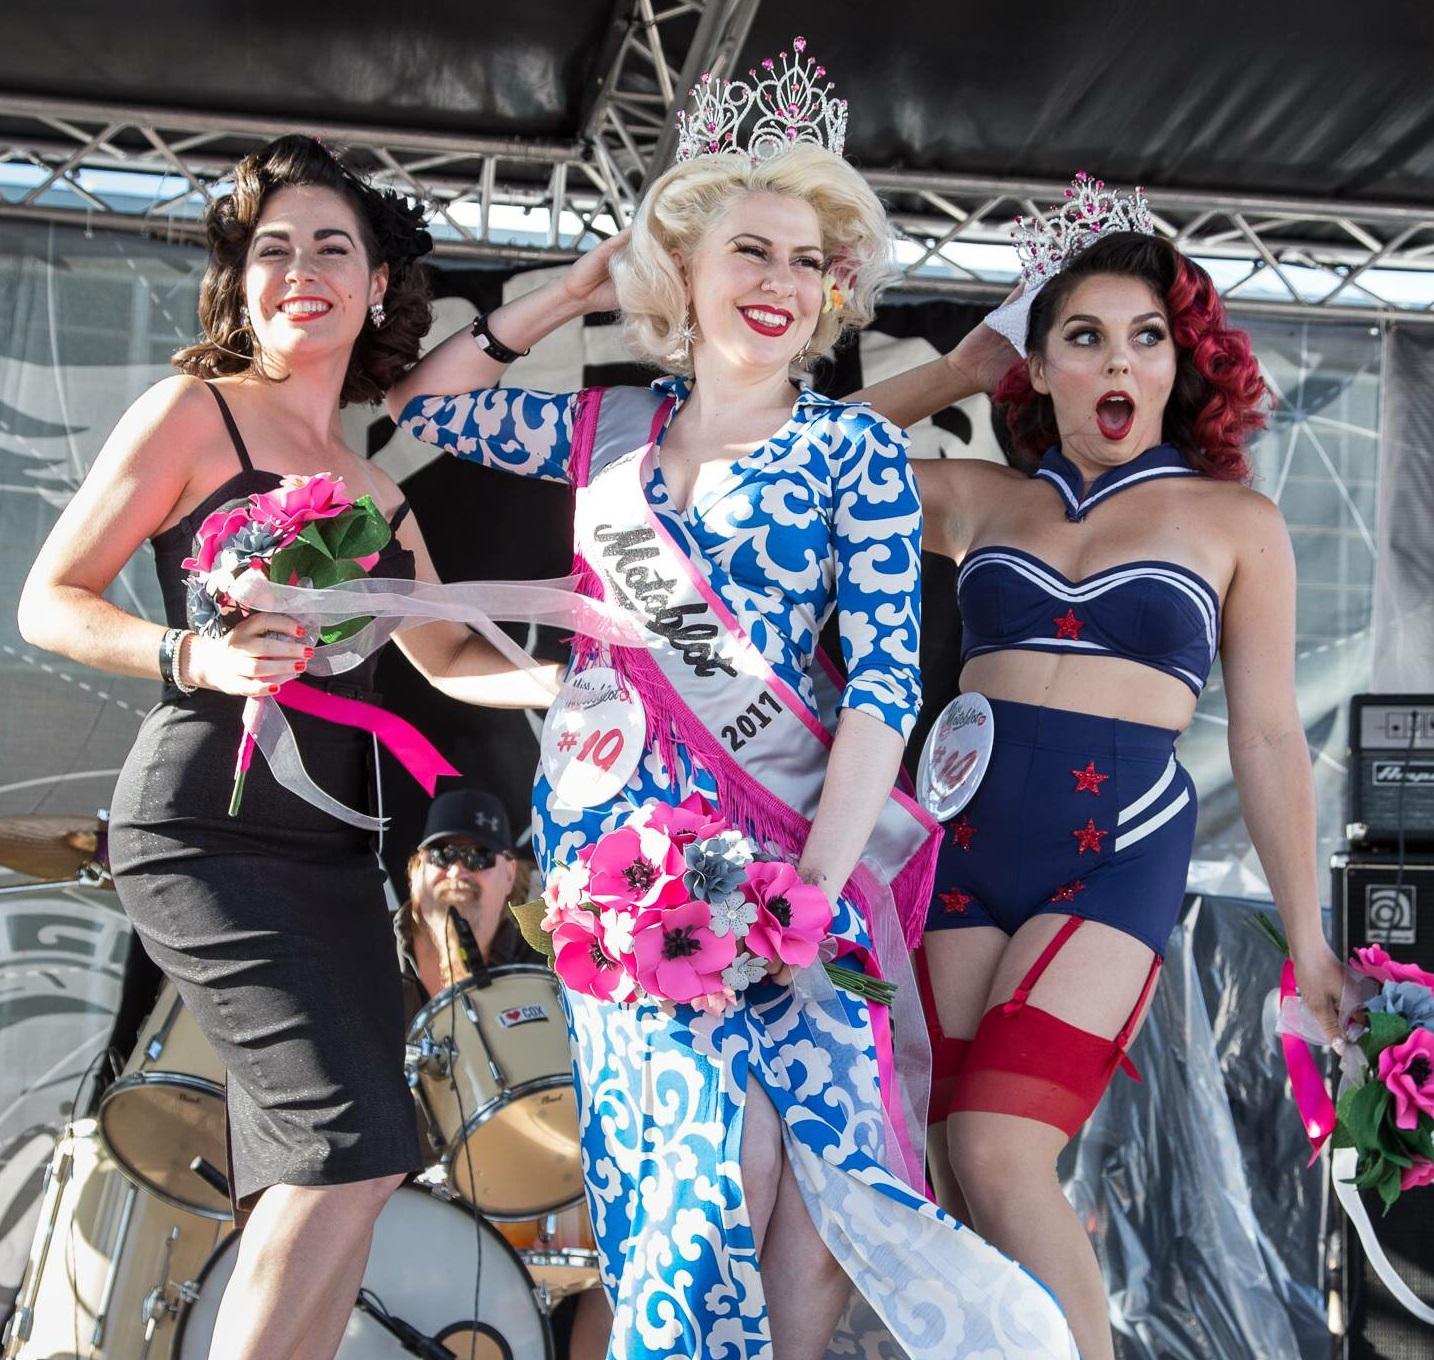 2017 Miss Motoblot pinup contest winner